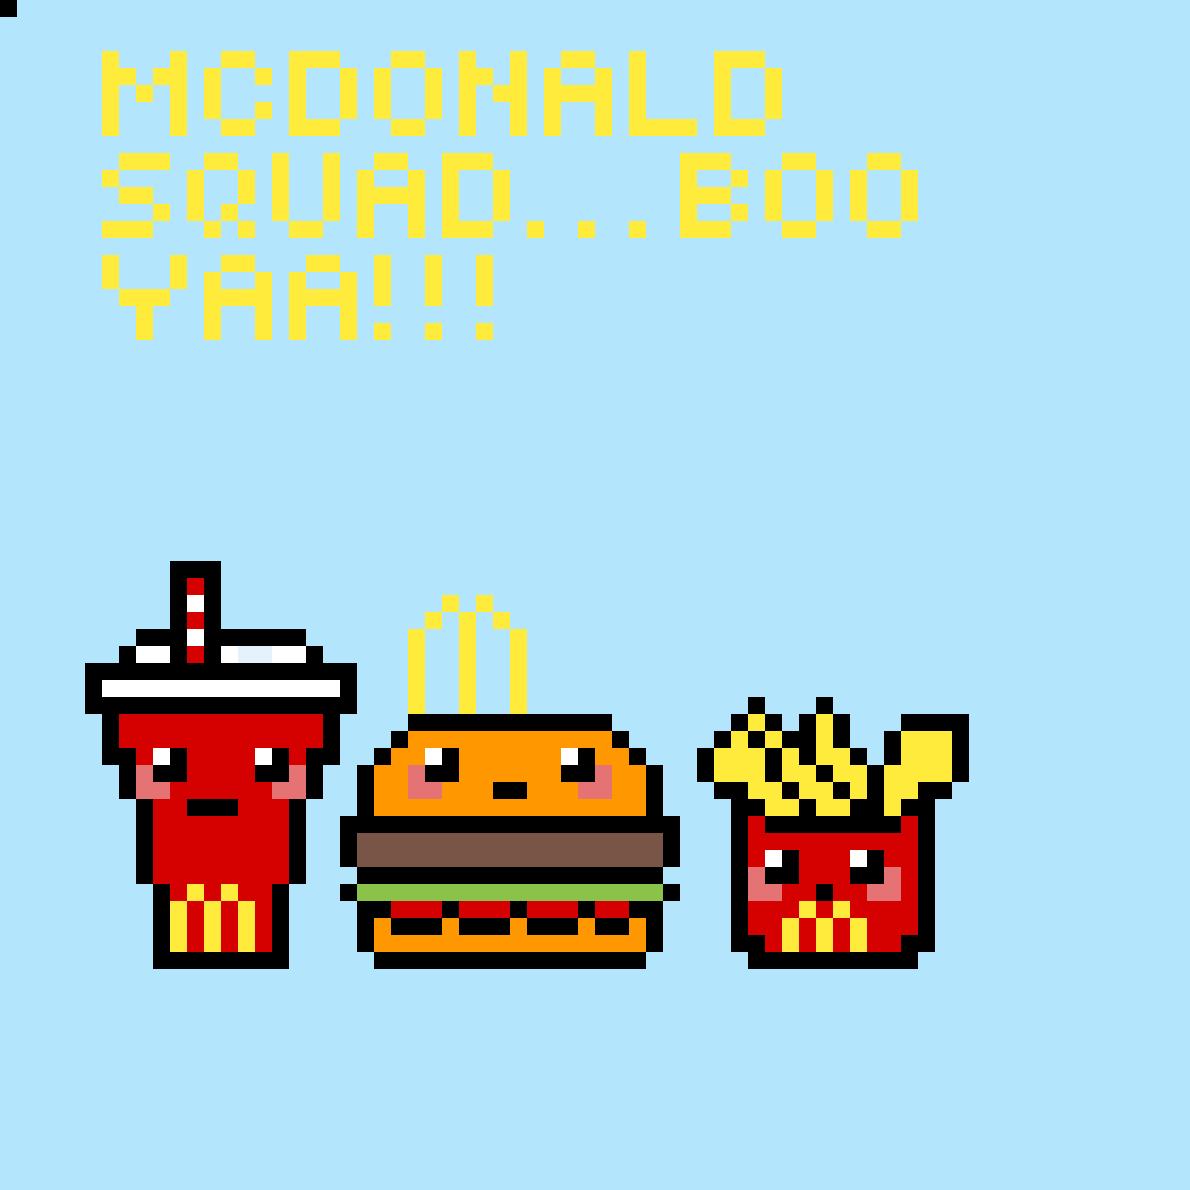 Mcdonald by HappyXDXD